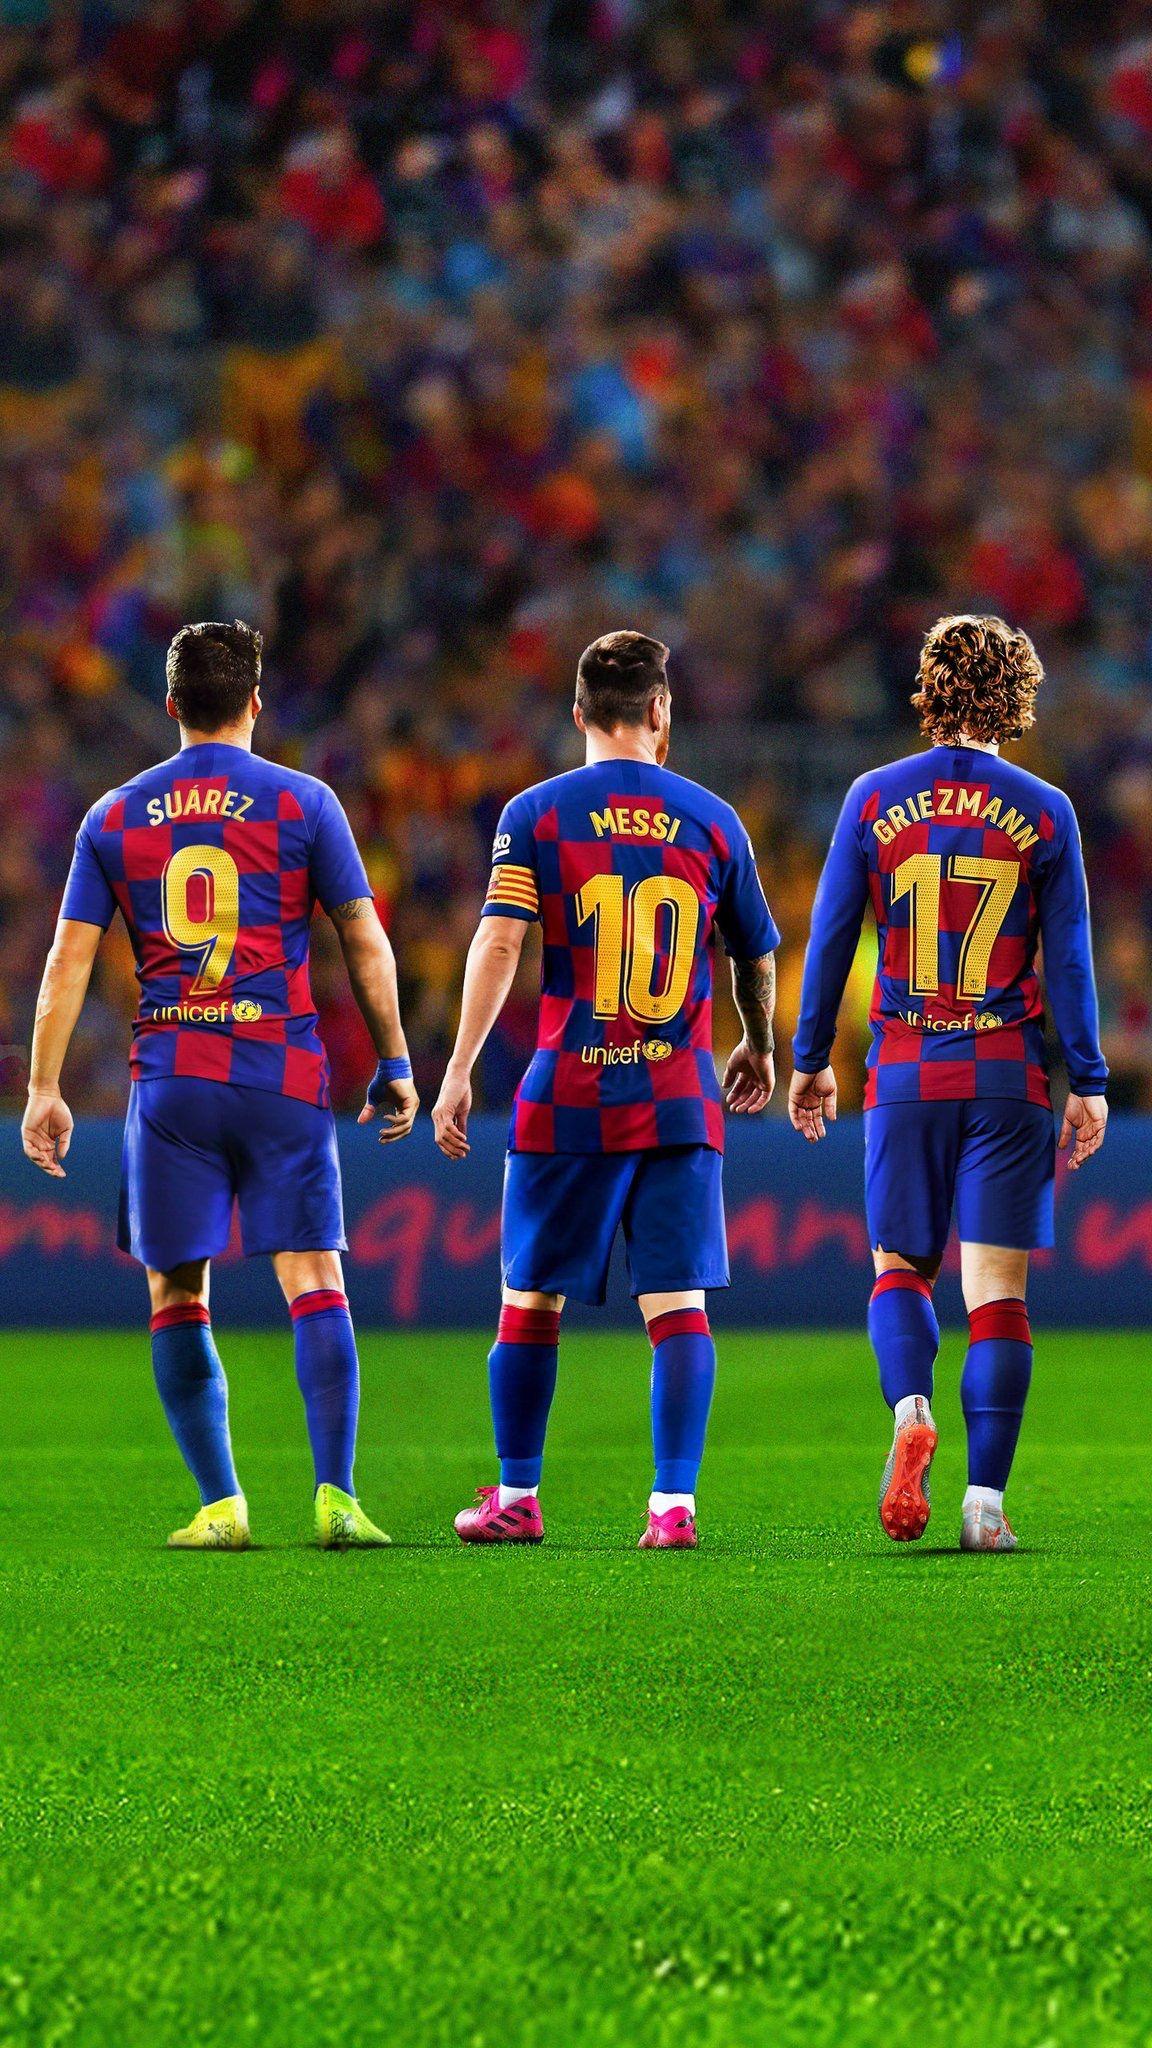 Fcbarcelona 2019 2020 Futbol De Barcelona Fotos De Messi Fotos De Futbol